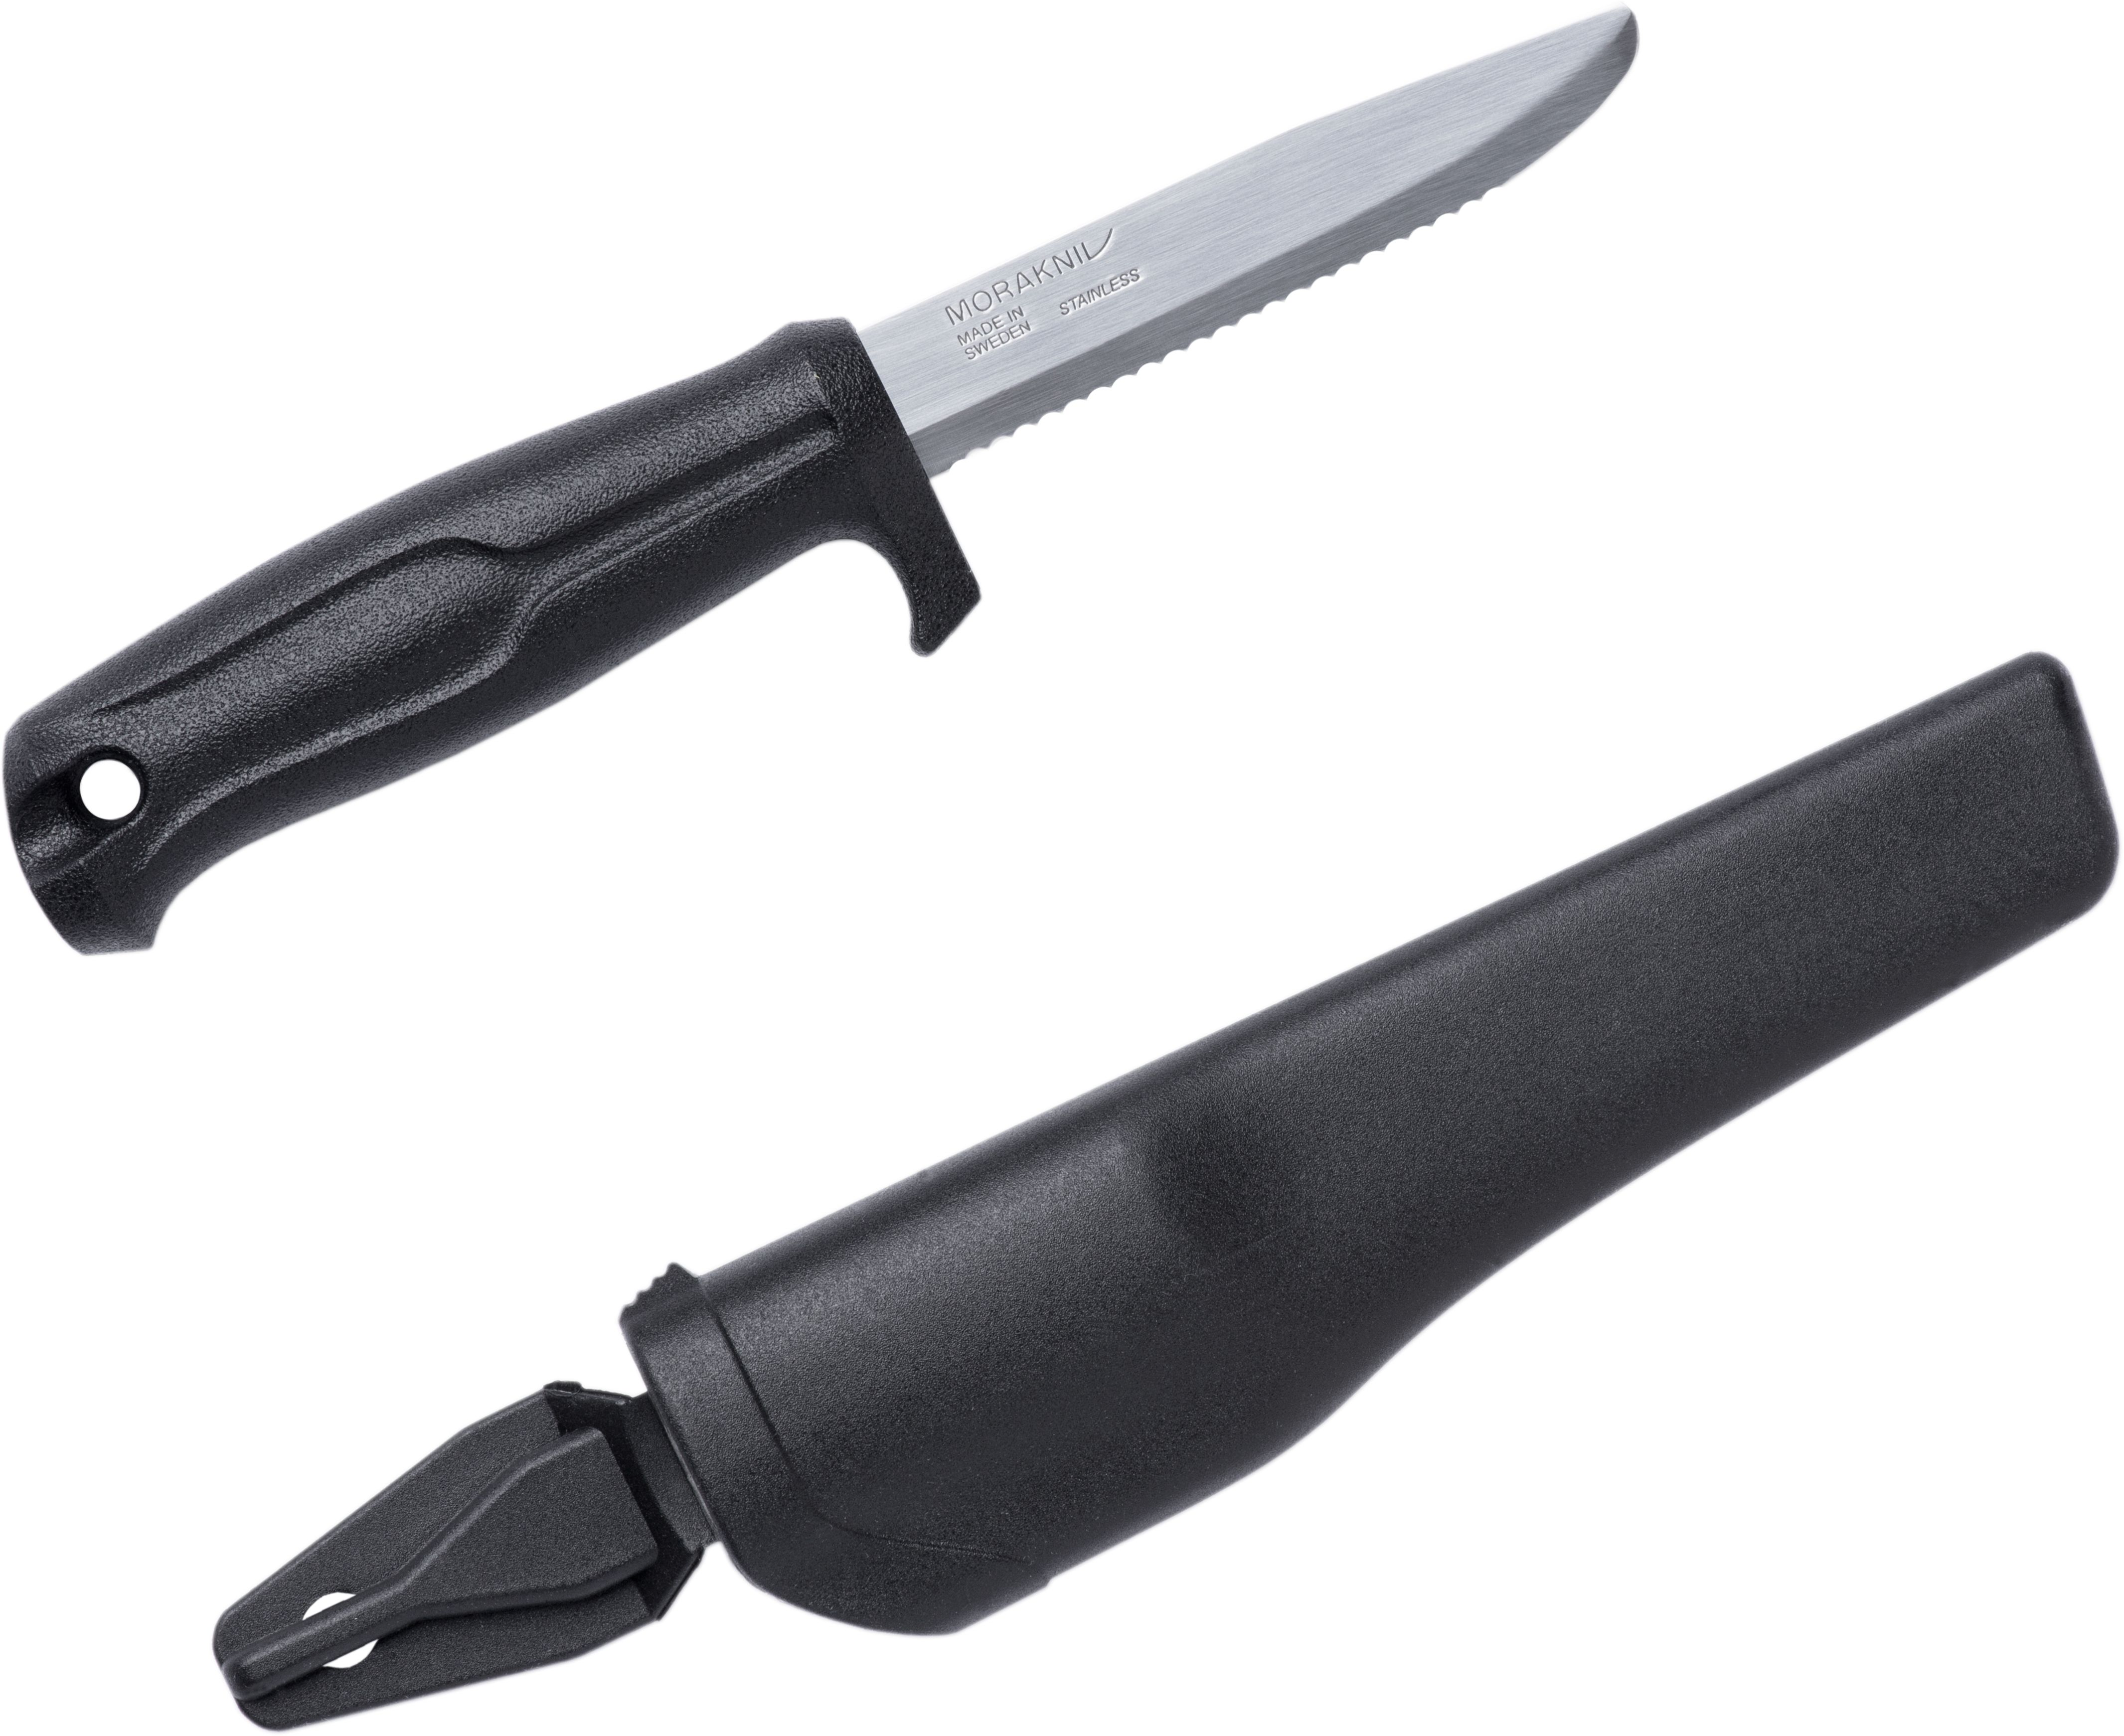 Morakniv Mora of Sweden Marine Rescue 541 Fixed 3.625 inch Stainless Steel Combo Blade, Black Polymer Handle, Black Polymer Sheath